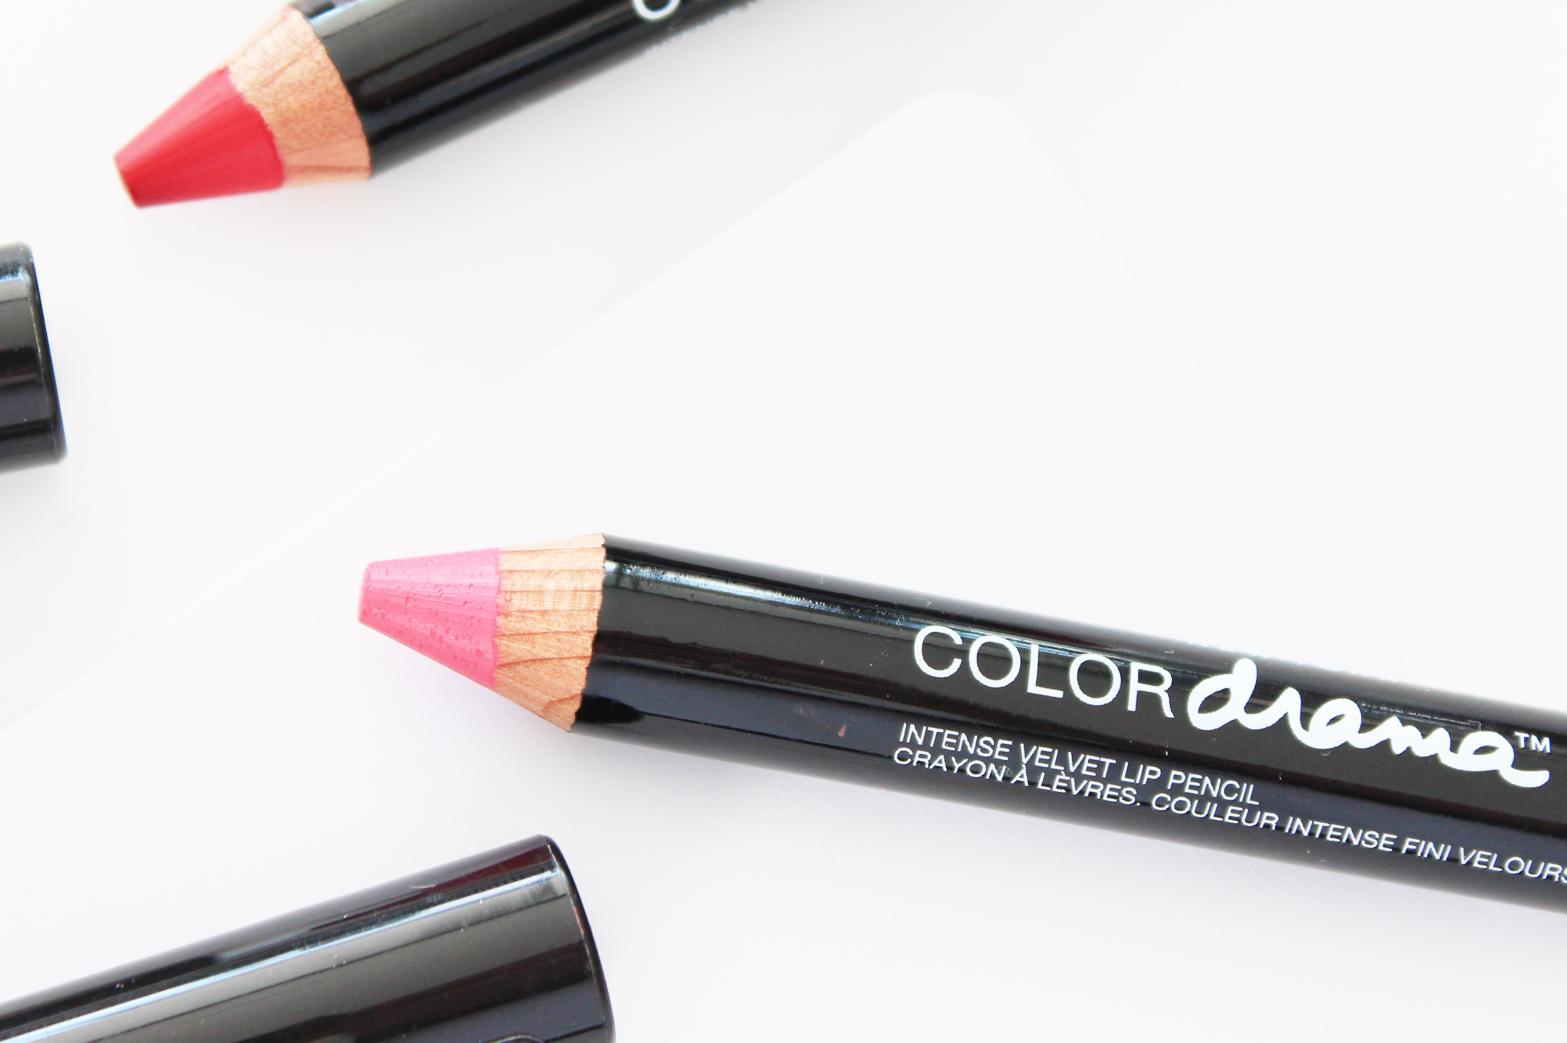 MAYBELLINE | Color Drama Intense Velvet Lip Pencils Review + Swatches - CassandraMyee